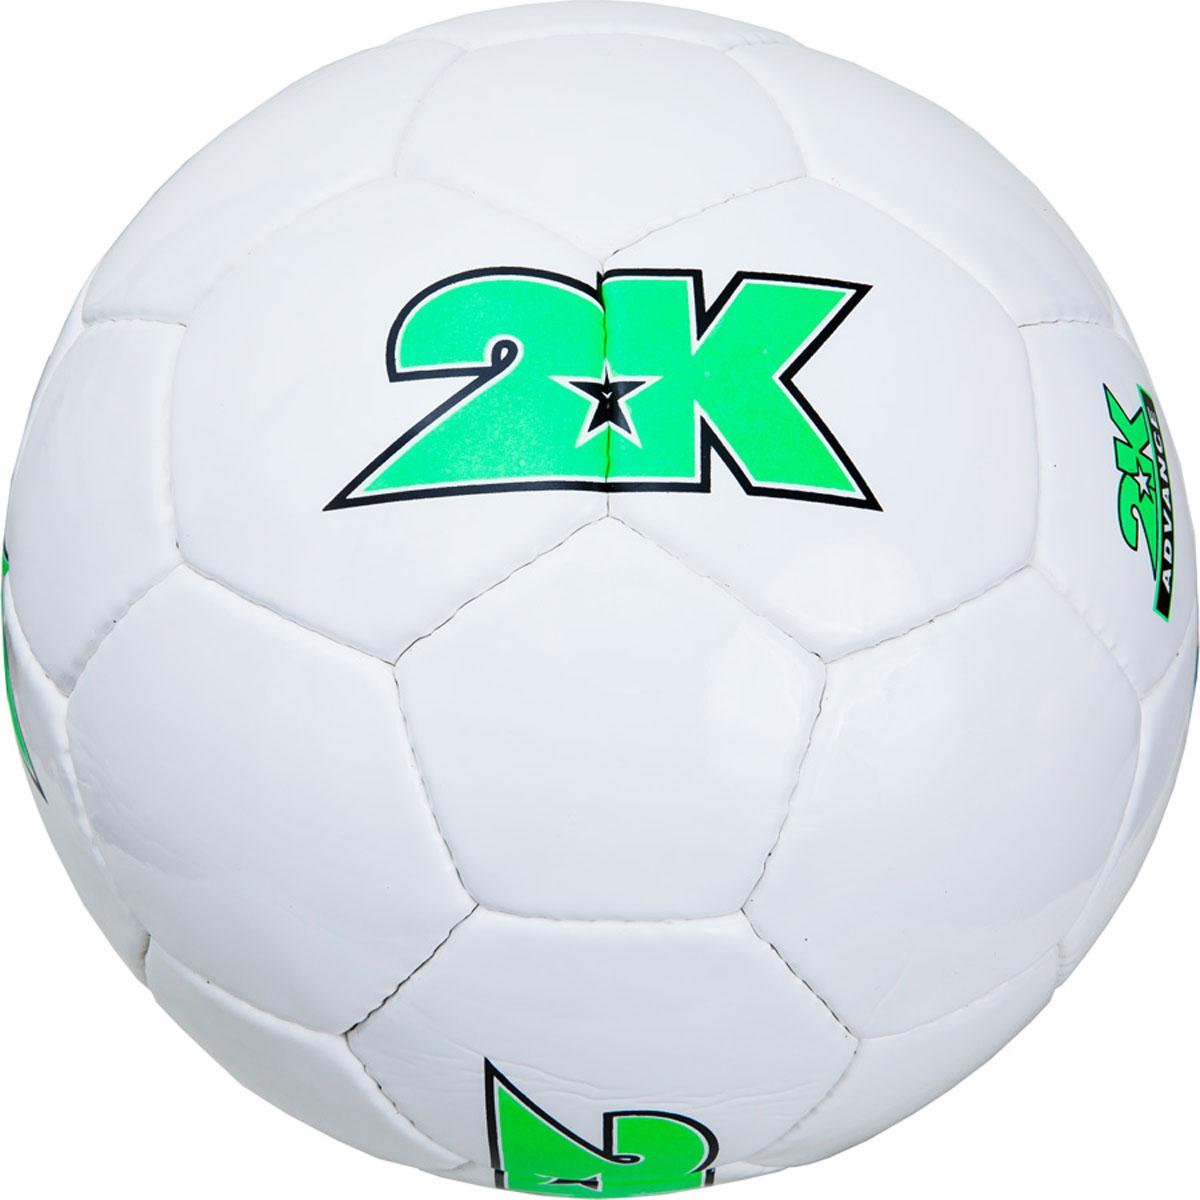 Мяч футбольный 2K Sport Advance, цвет: белый, зеленый. Размер 5 мяч футбольный 2k sport advance цвет белый оранжевый размер 5